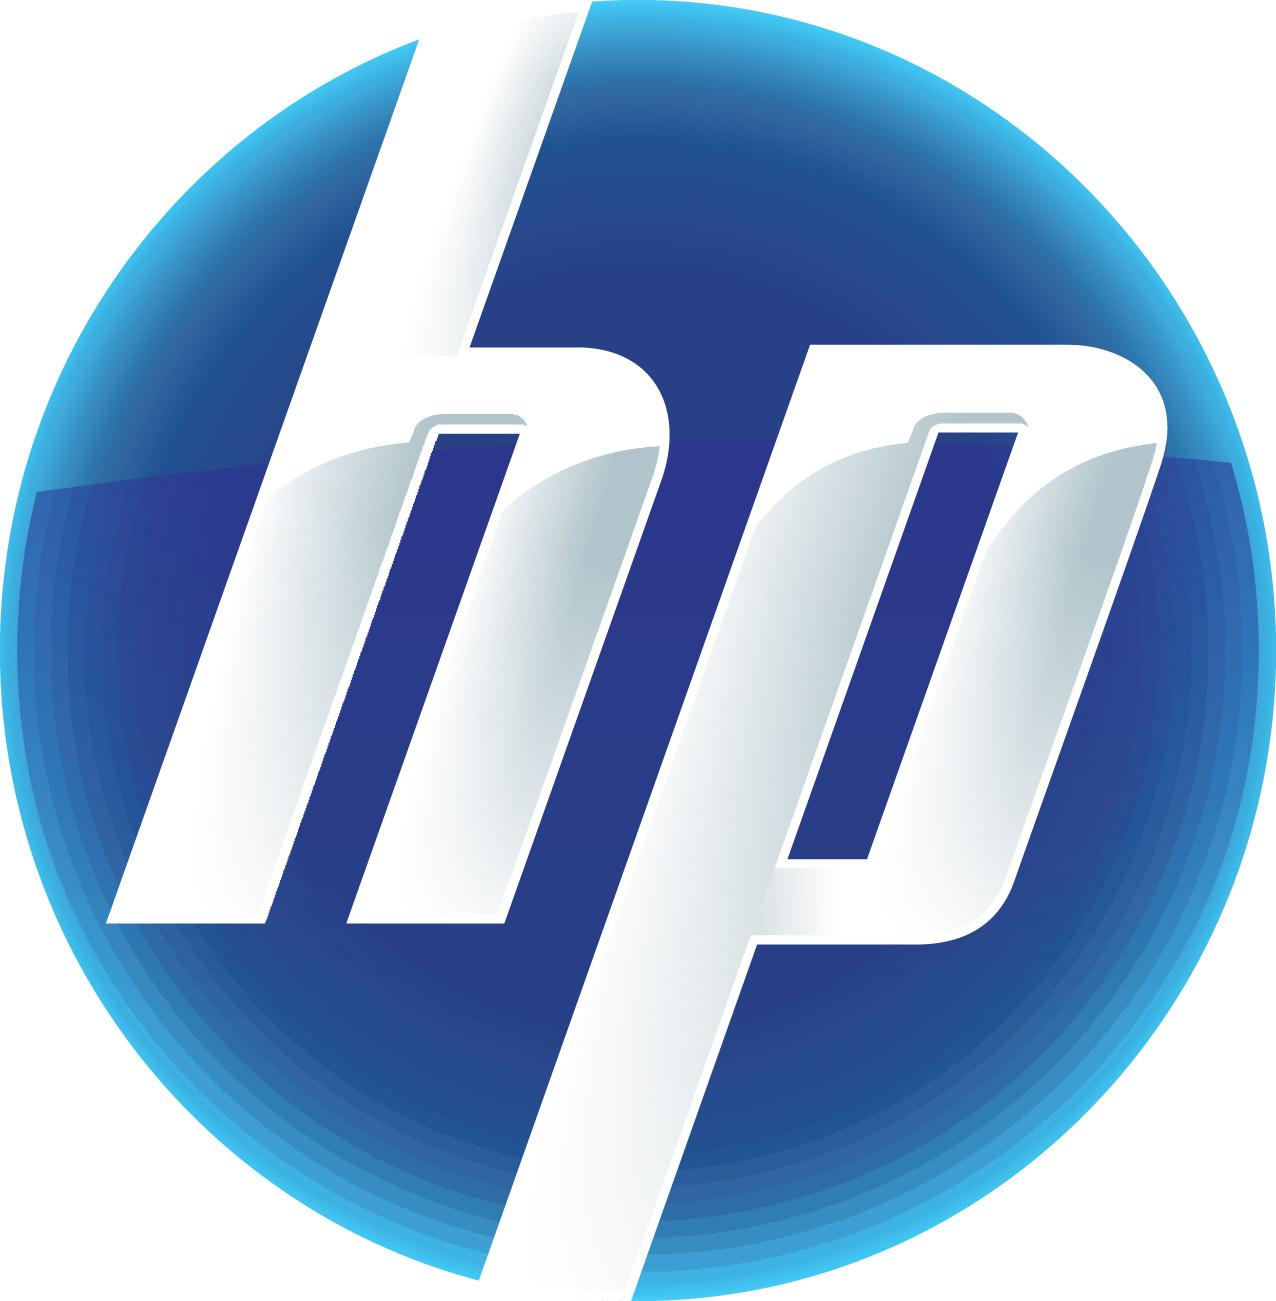 Creative Pin - A Graphic Design Resource: Hewlett Packard ...